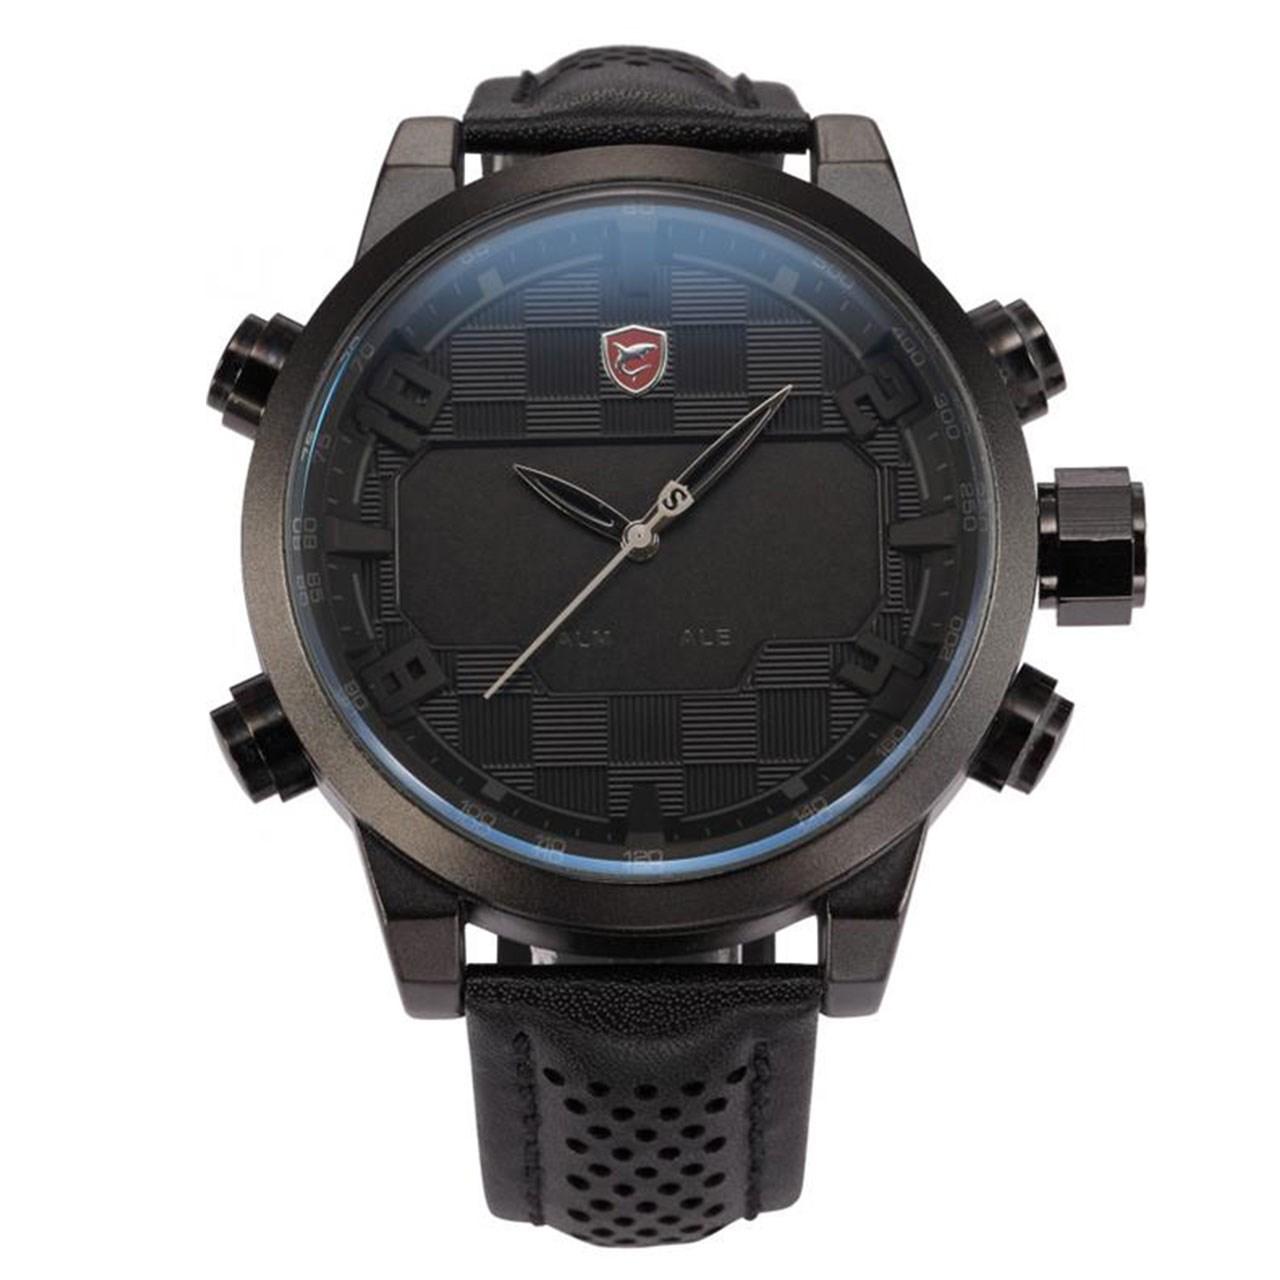 ساعت مچی  مردانه شارک اسپرت مدل SH205              اصل